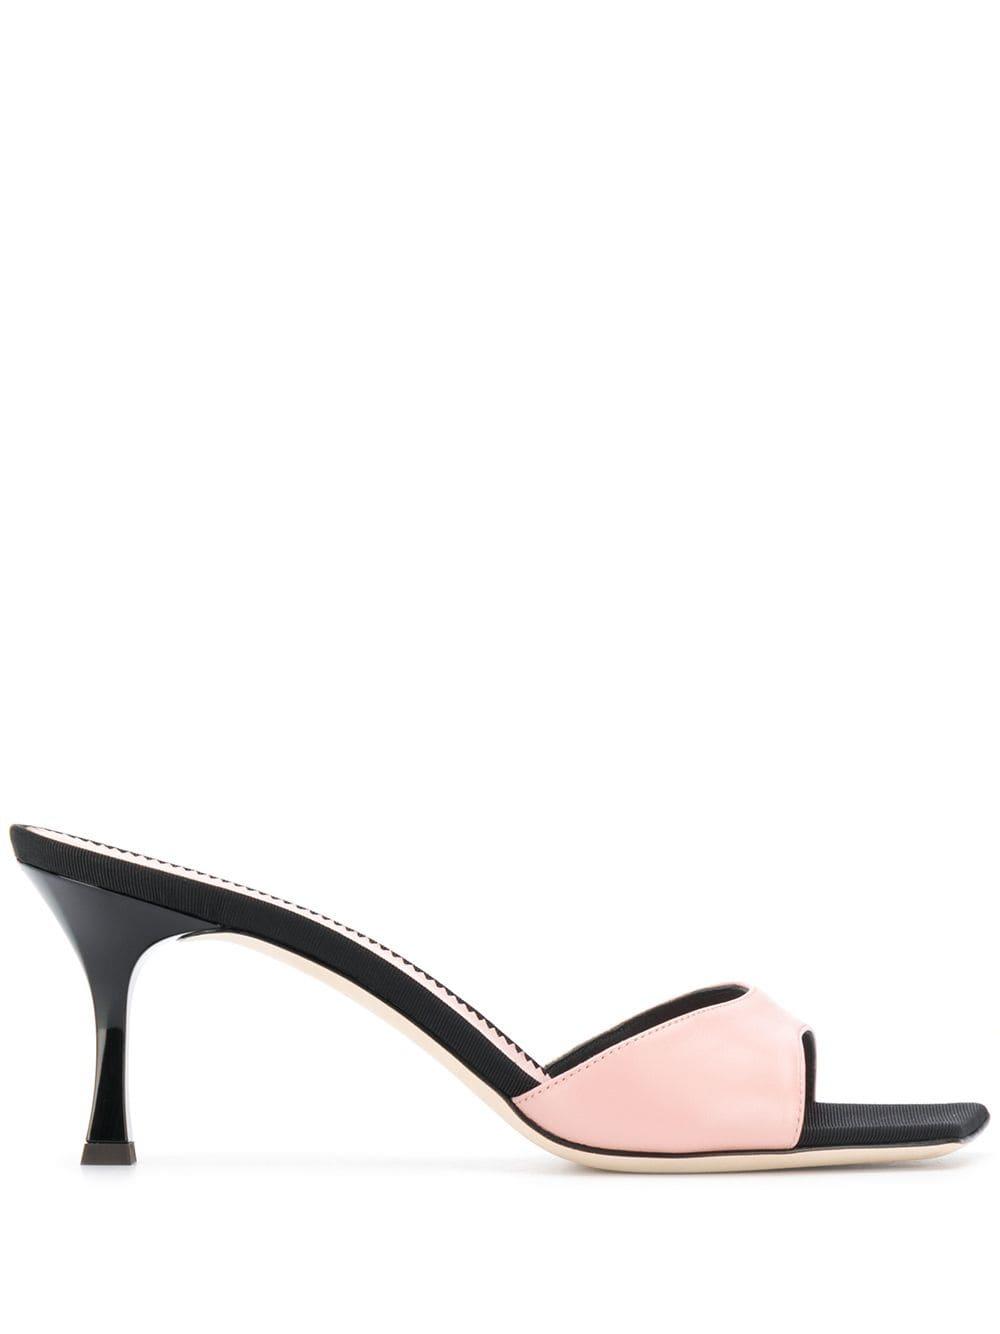 4a195ba80ec49 Black And Pink Dem Sandals - GIUSEPPE ZANOTTI - Russocapri